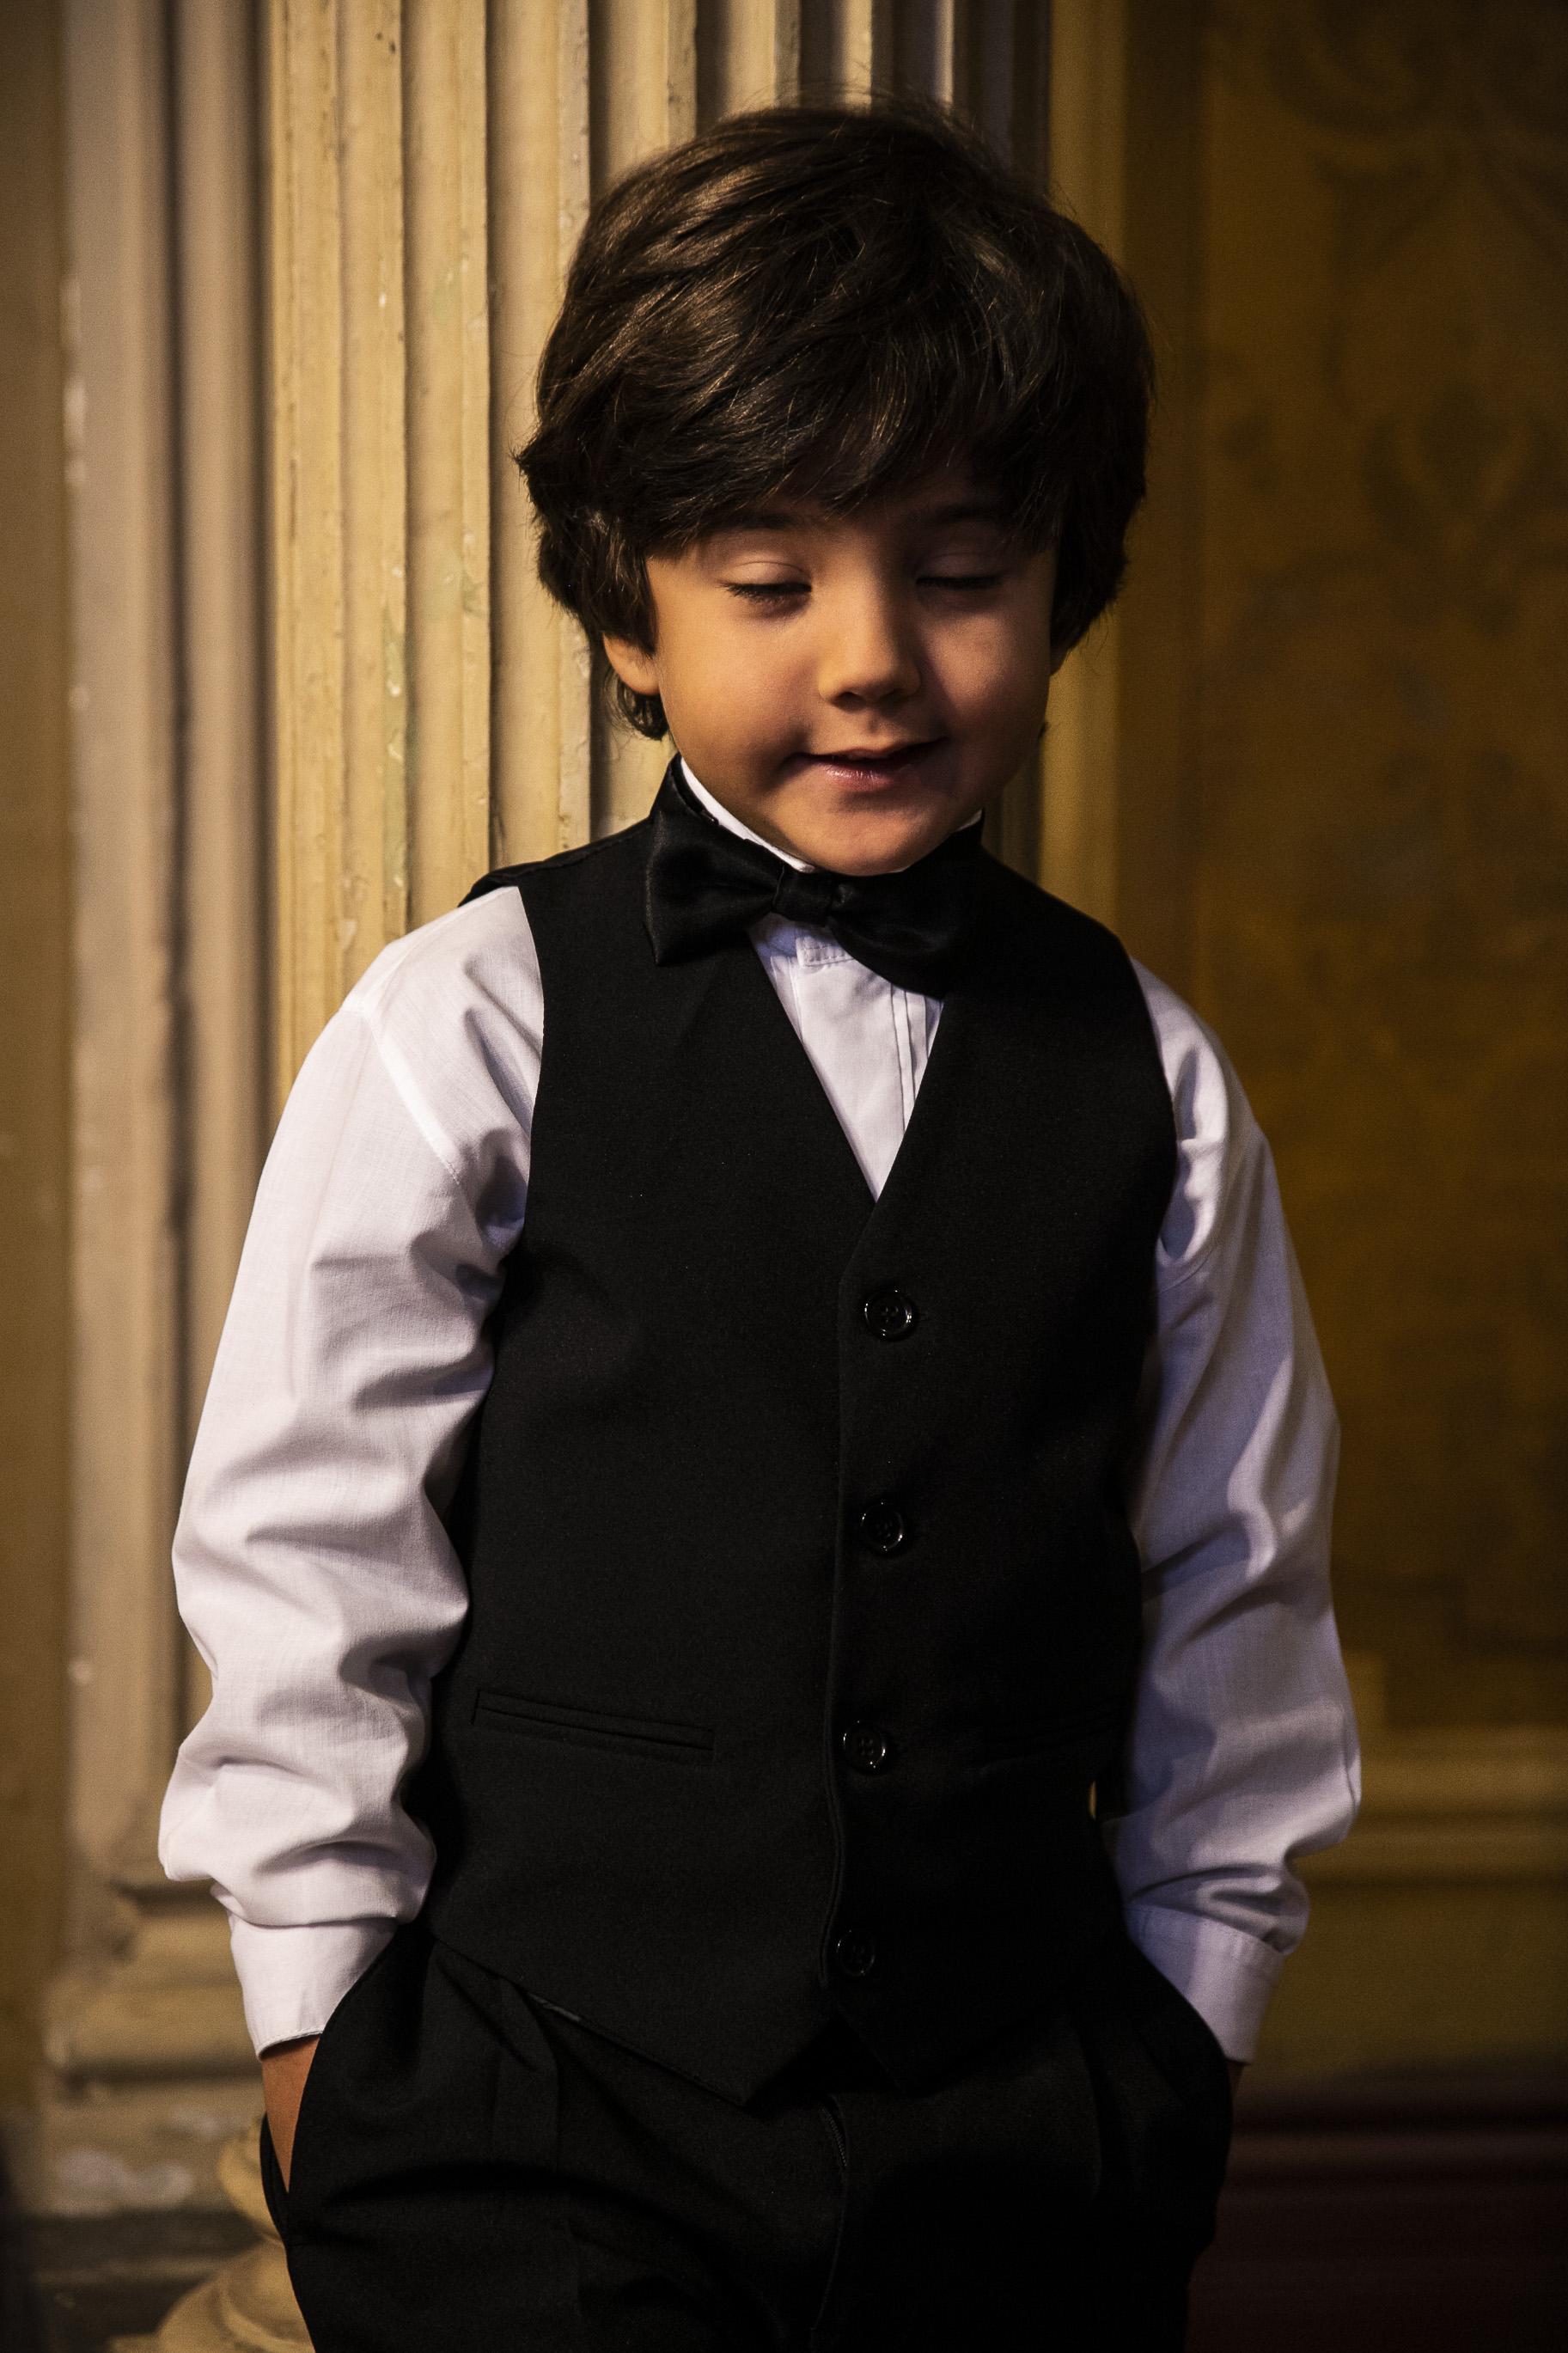 1 - Colete preto com gravata borboleta para pajem